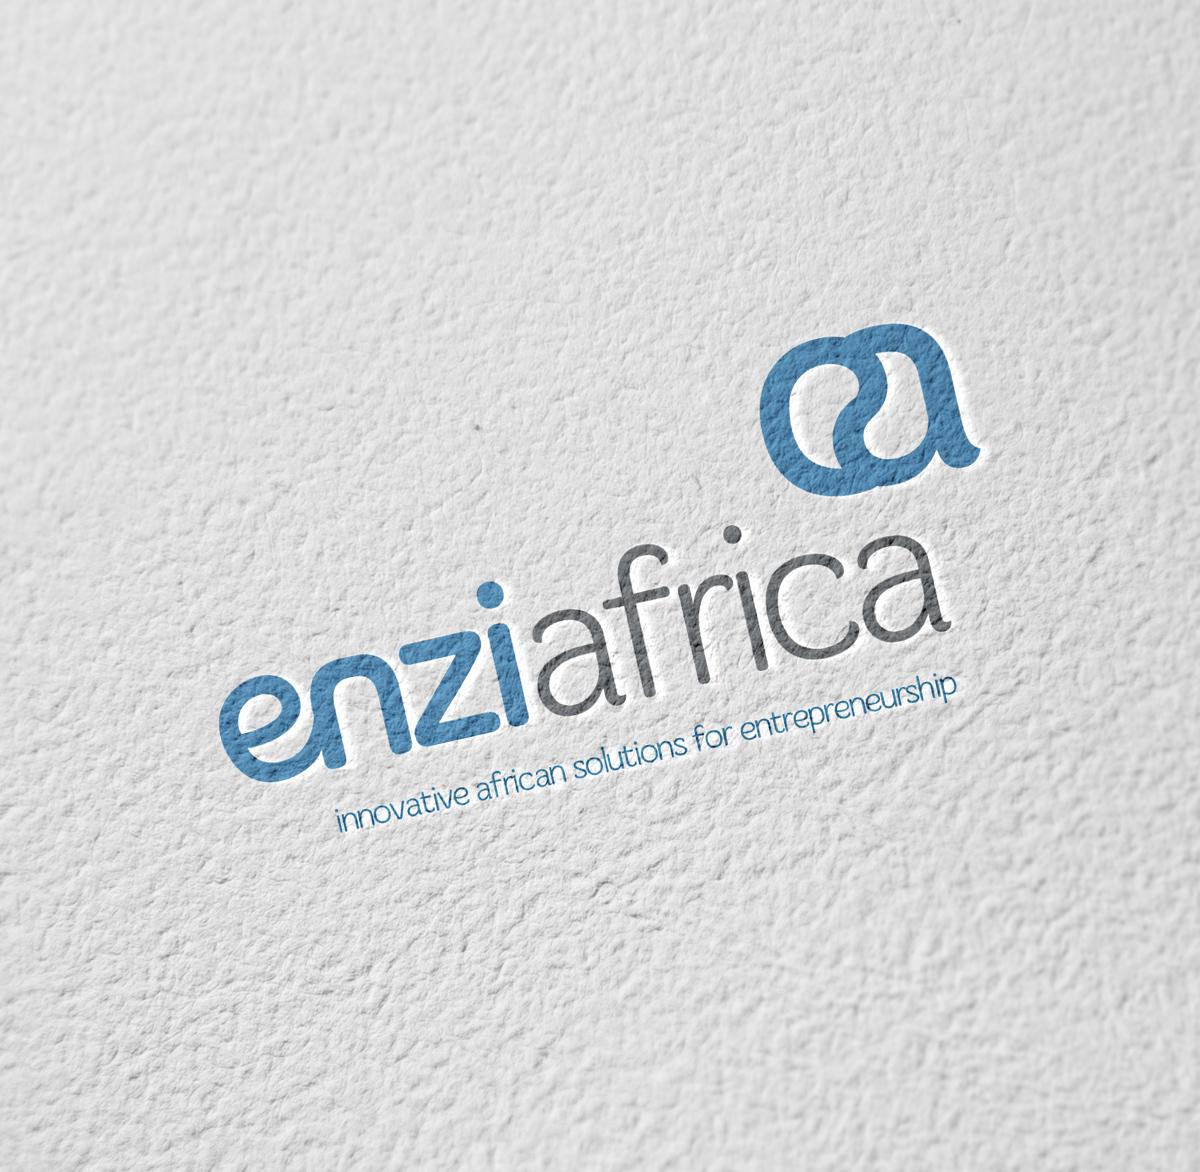 Enzi Africa Corporate Identity